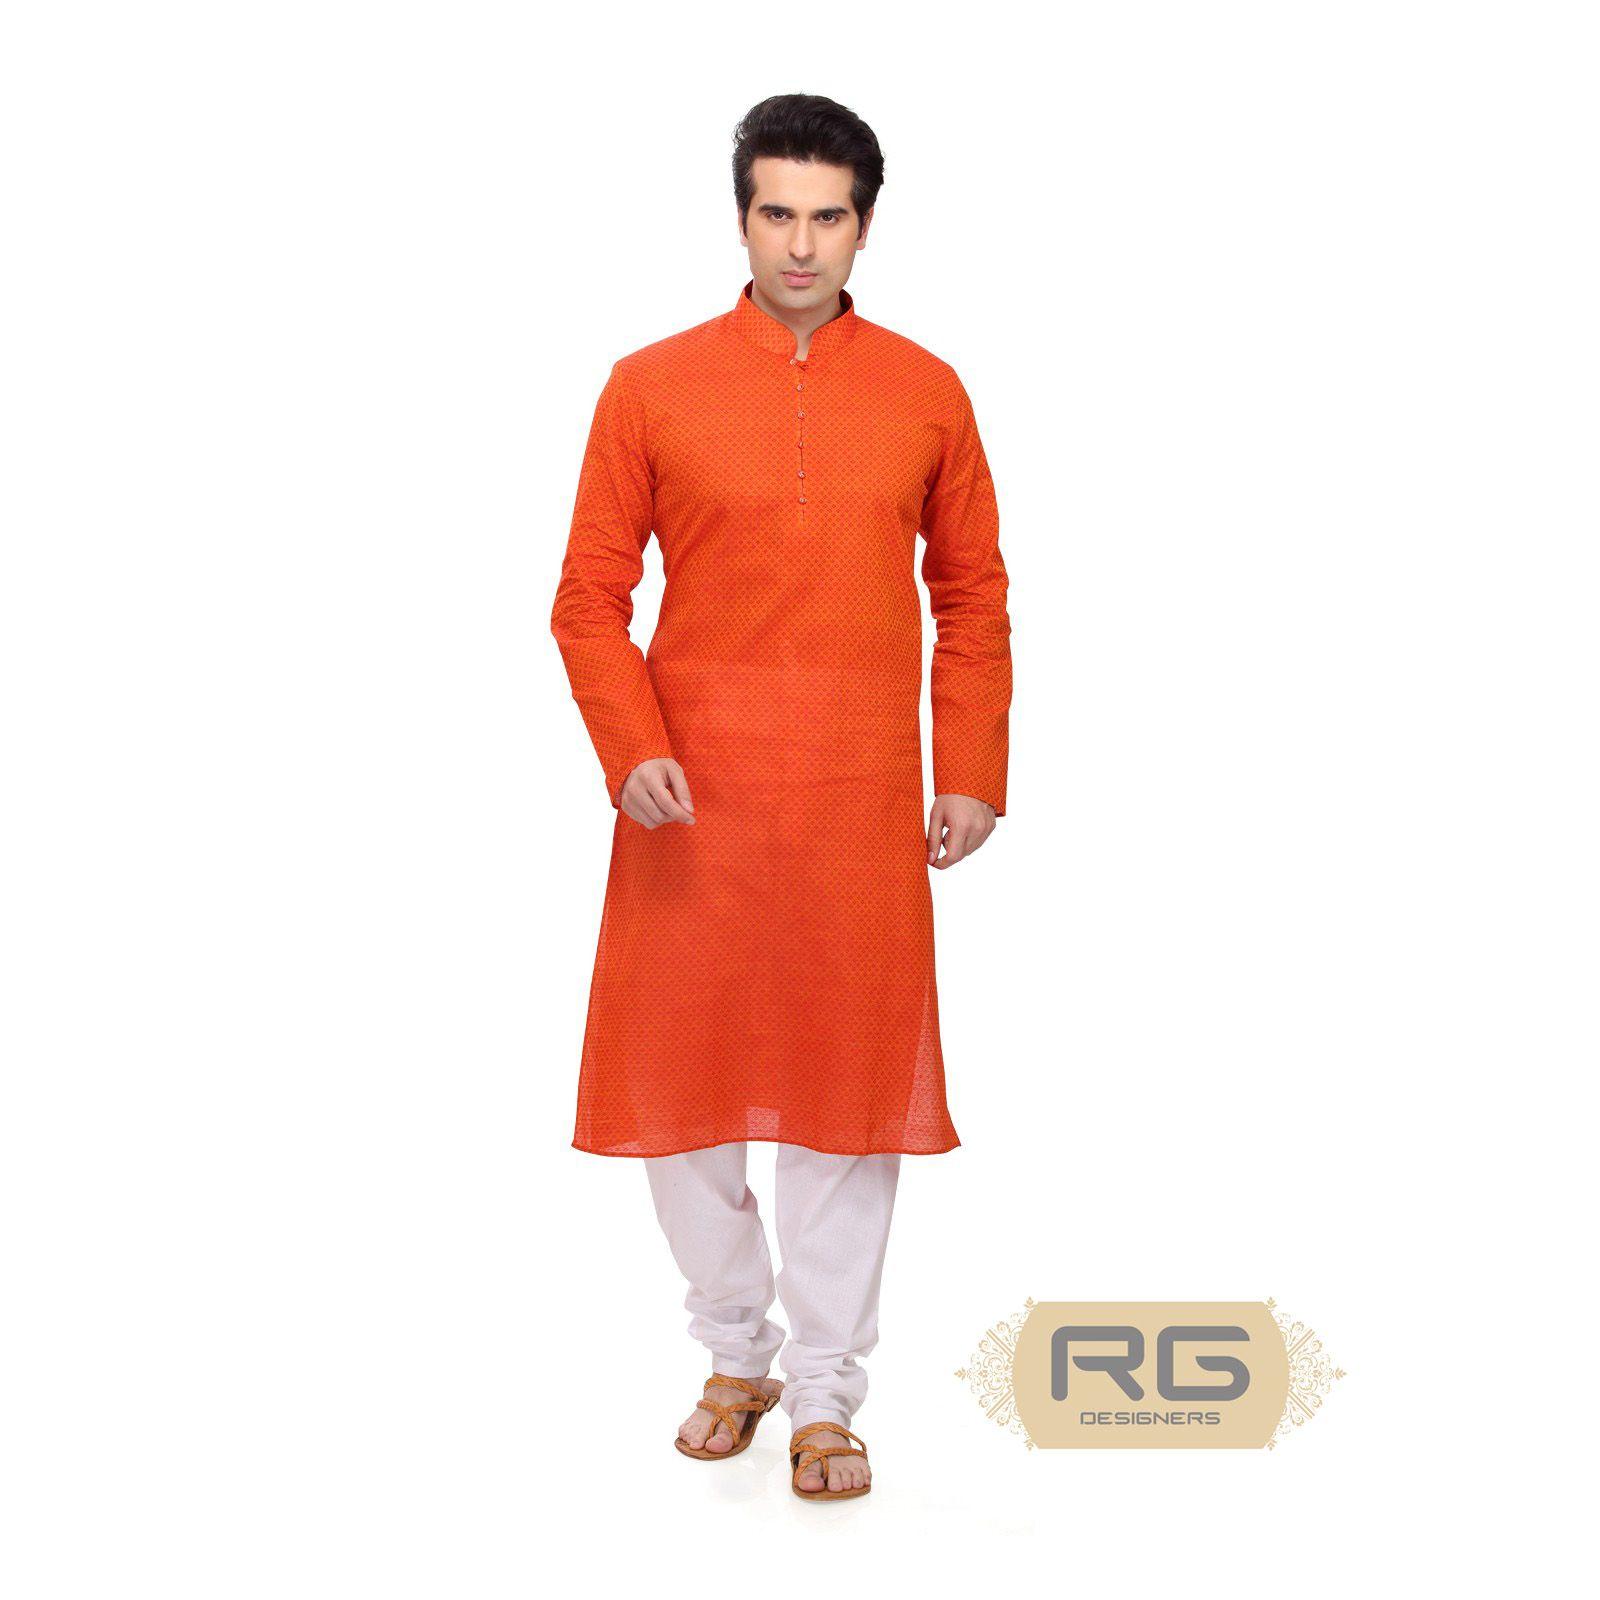 4cdef8929a Bright orange cotton hand-loom kurta with self design and white churidar  pants, for men.    Cotton Kesri Moti Kurta Set    RG Designers